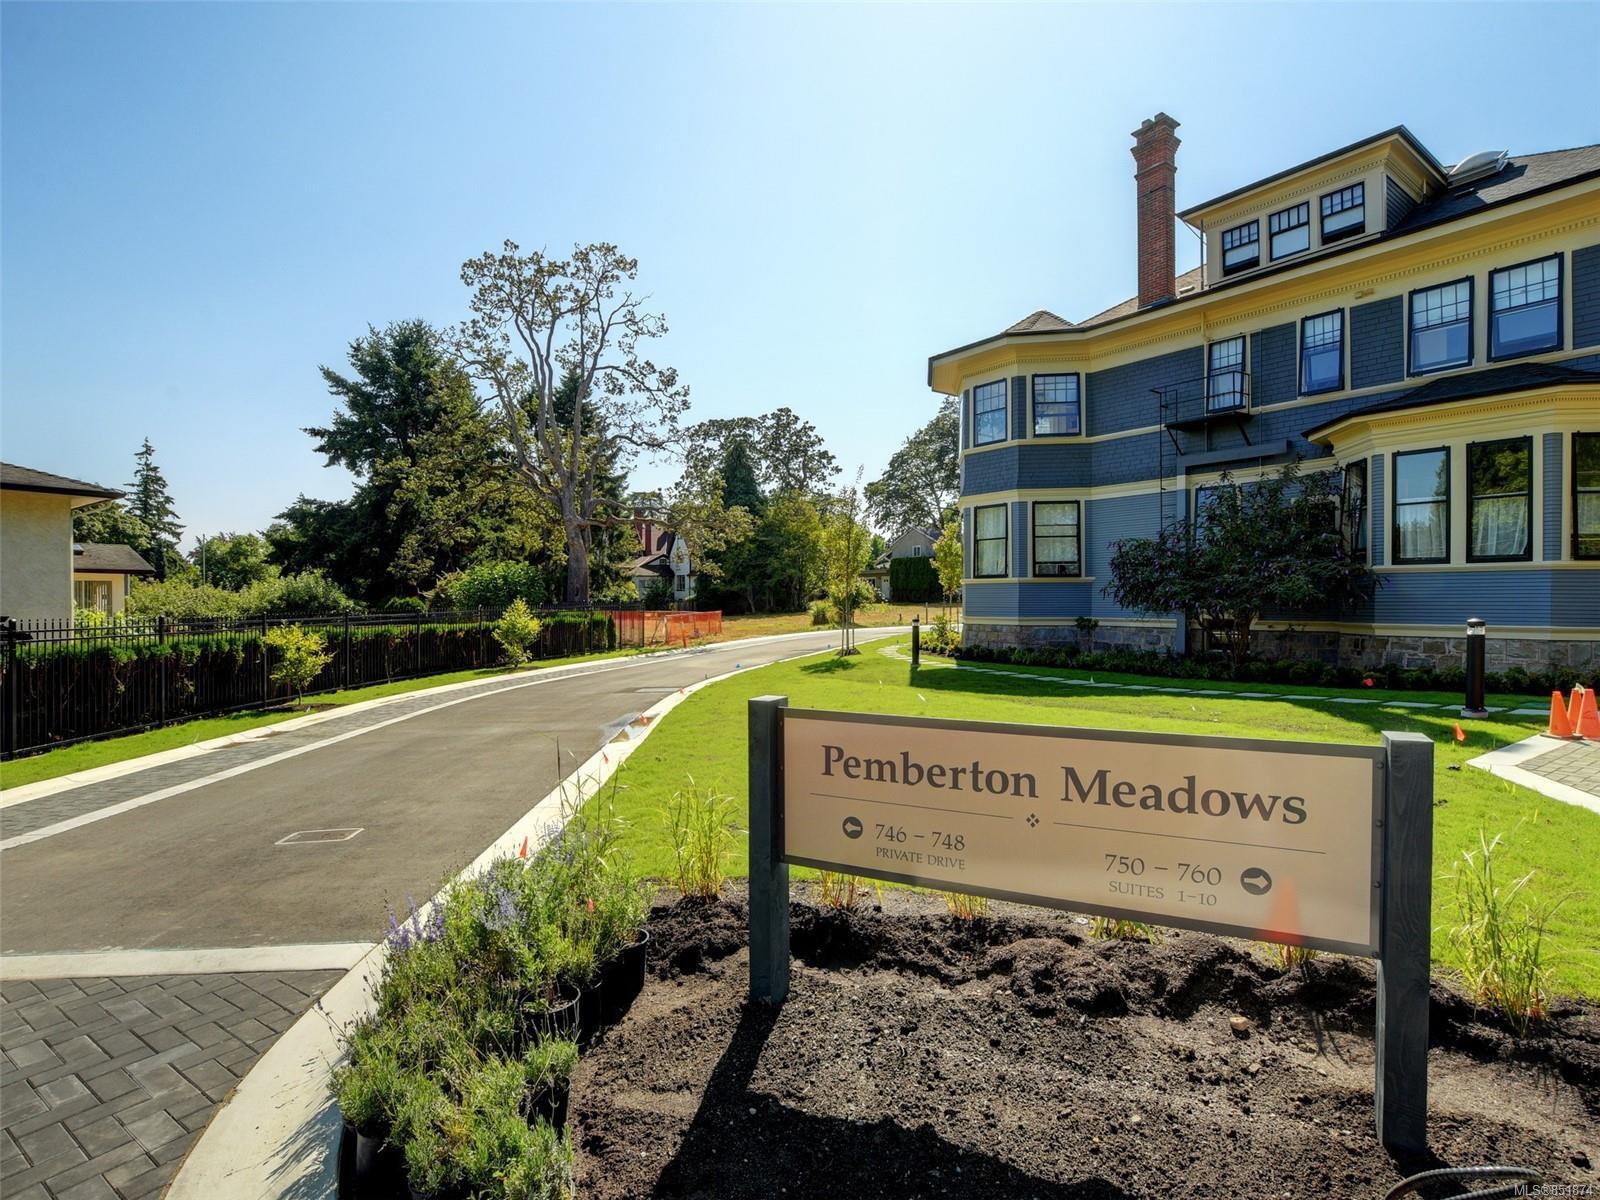 Main Photo: 746 Pemberton Rd in : Vi Rockland Land for sale (Victoria)  : MLS®# 851874